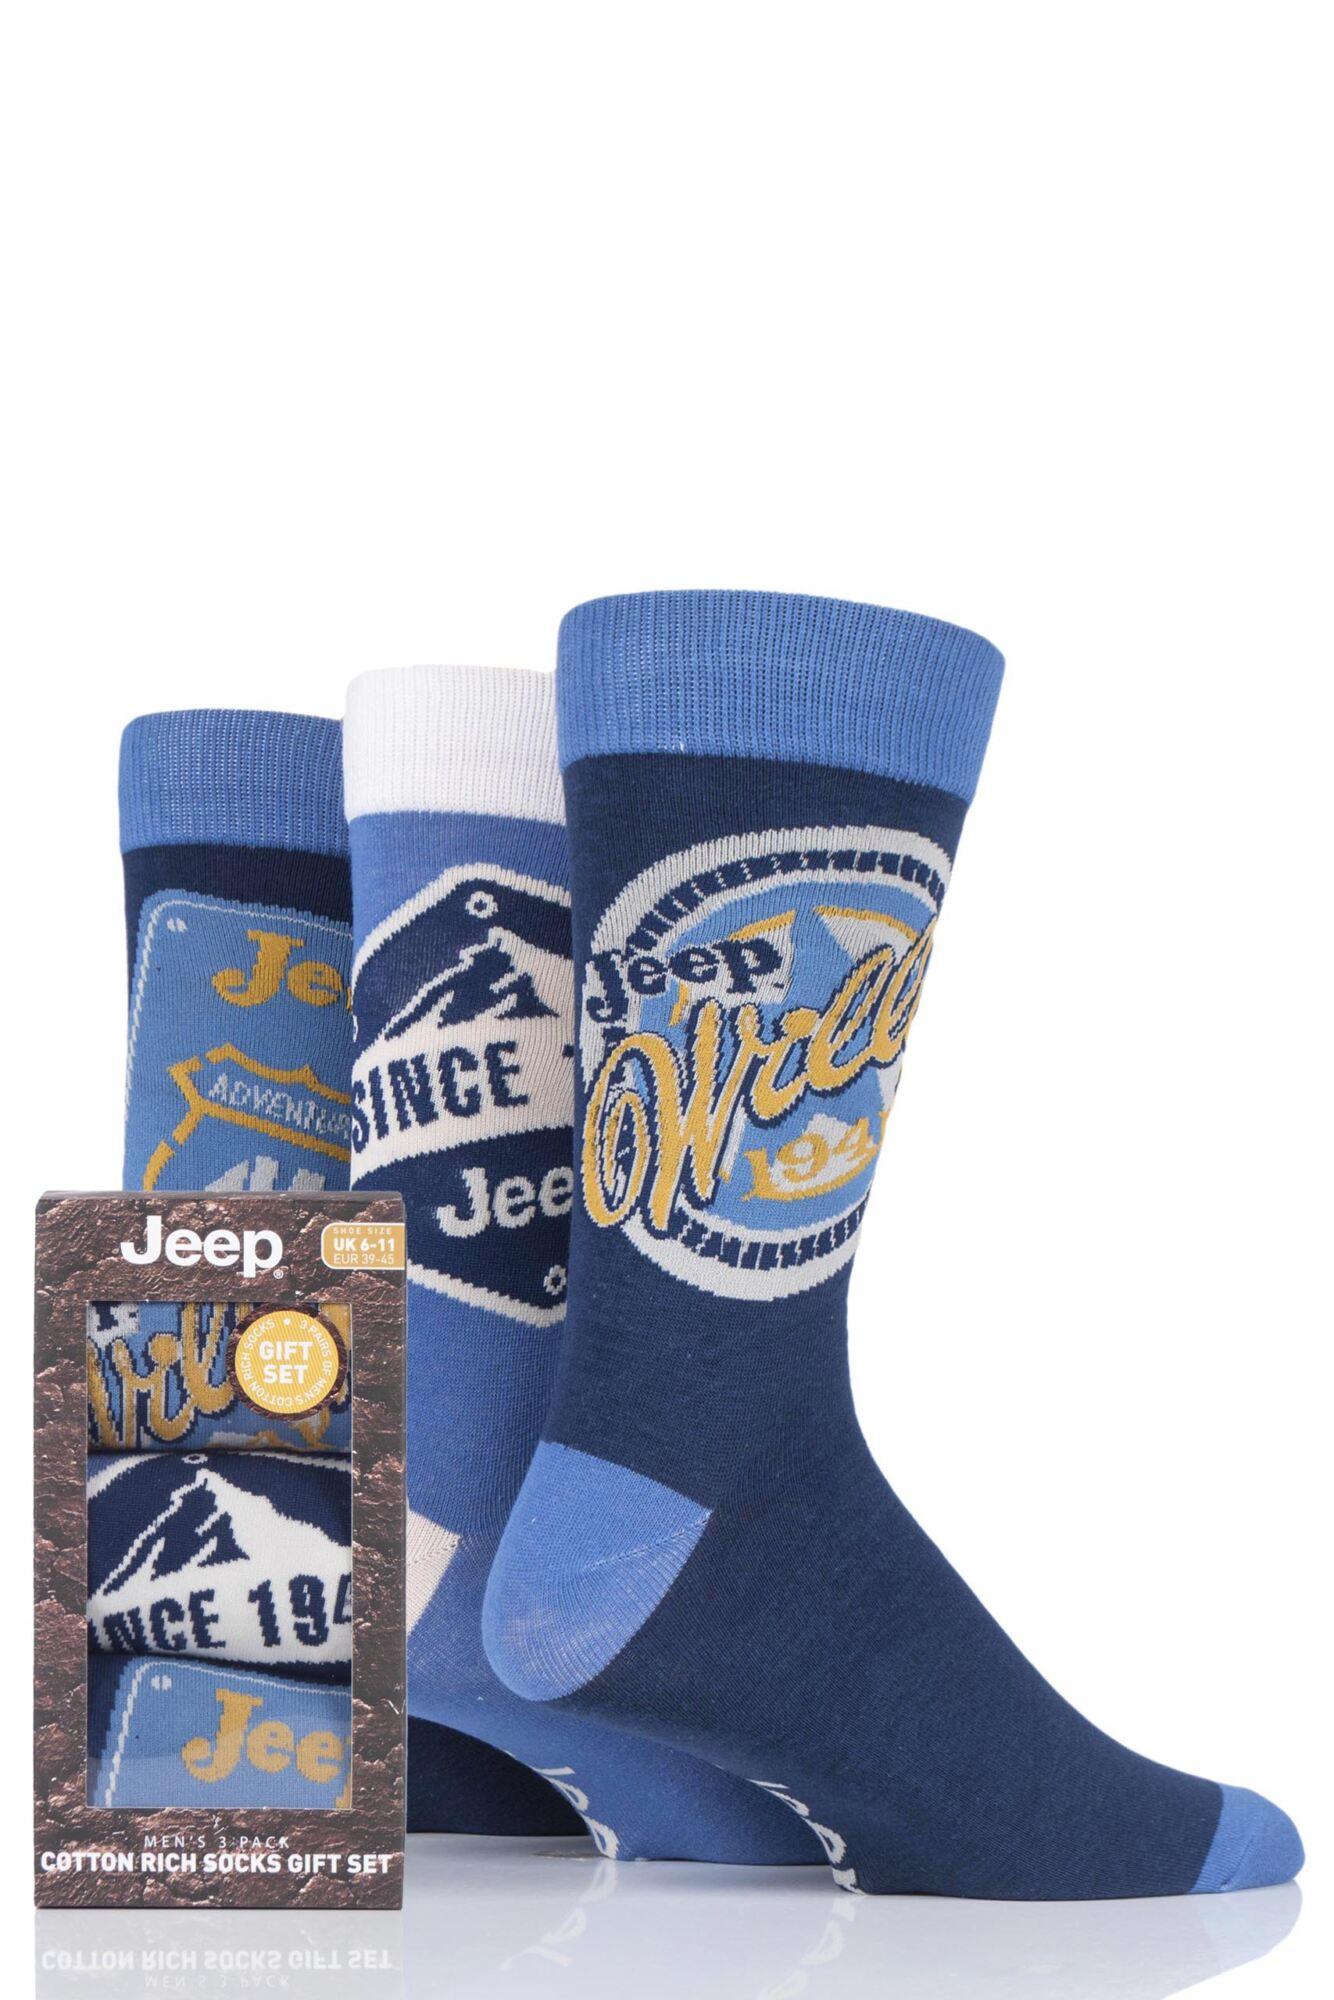 3 Pair Logo Gift Box Socks Men's - Jeep